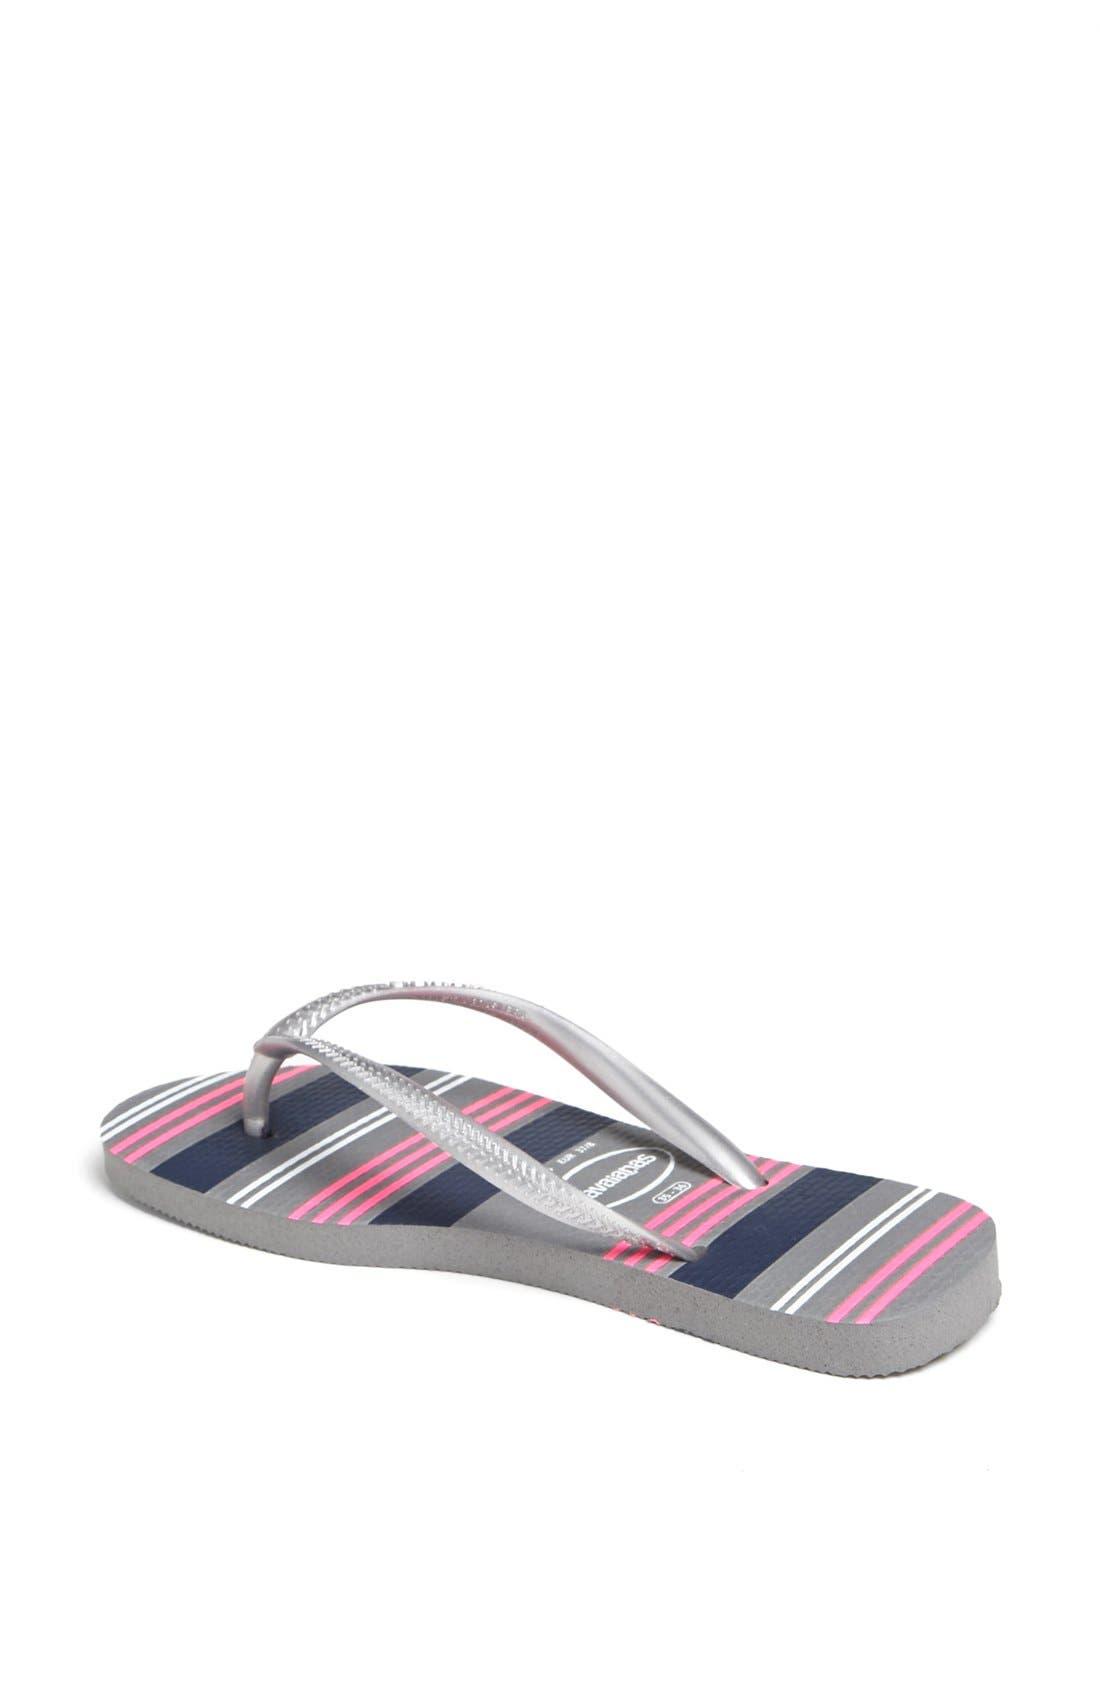 Alternate Image 2  - Havaianas 'Slim - Neon Stripes' Sandal